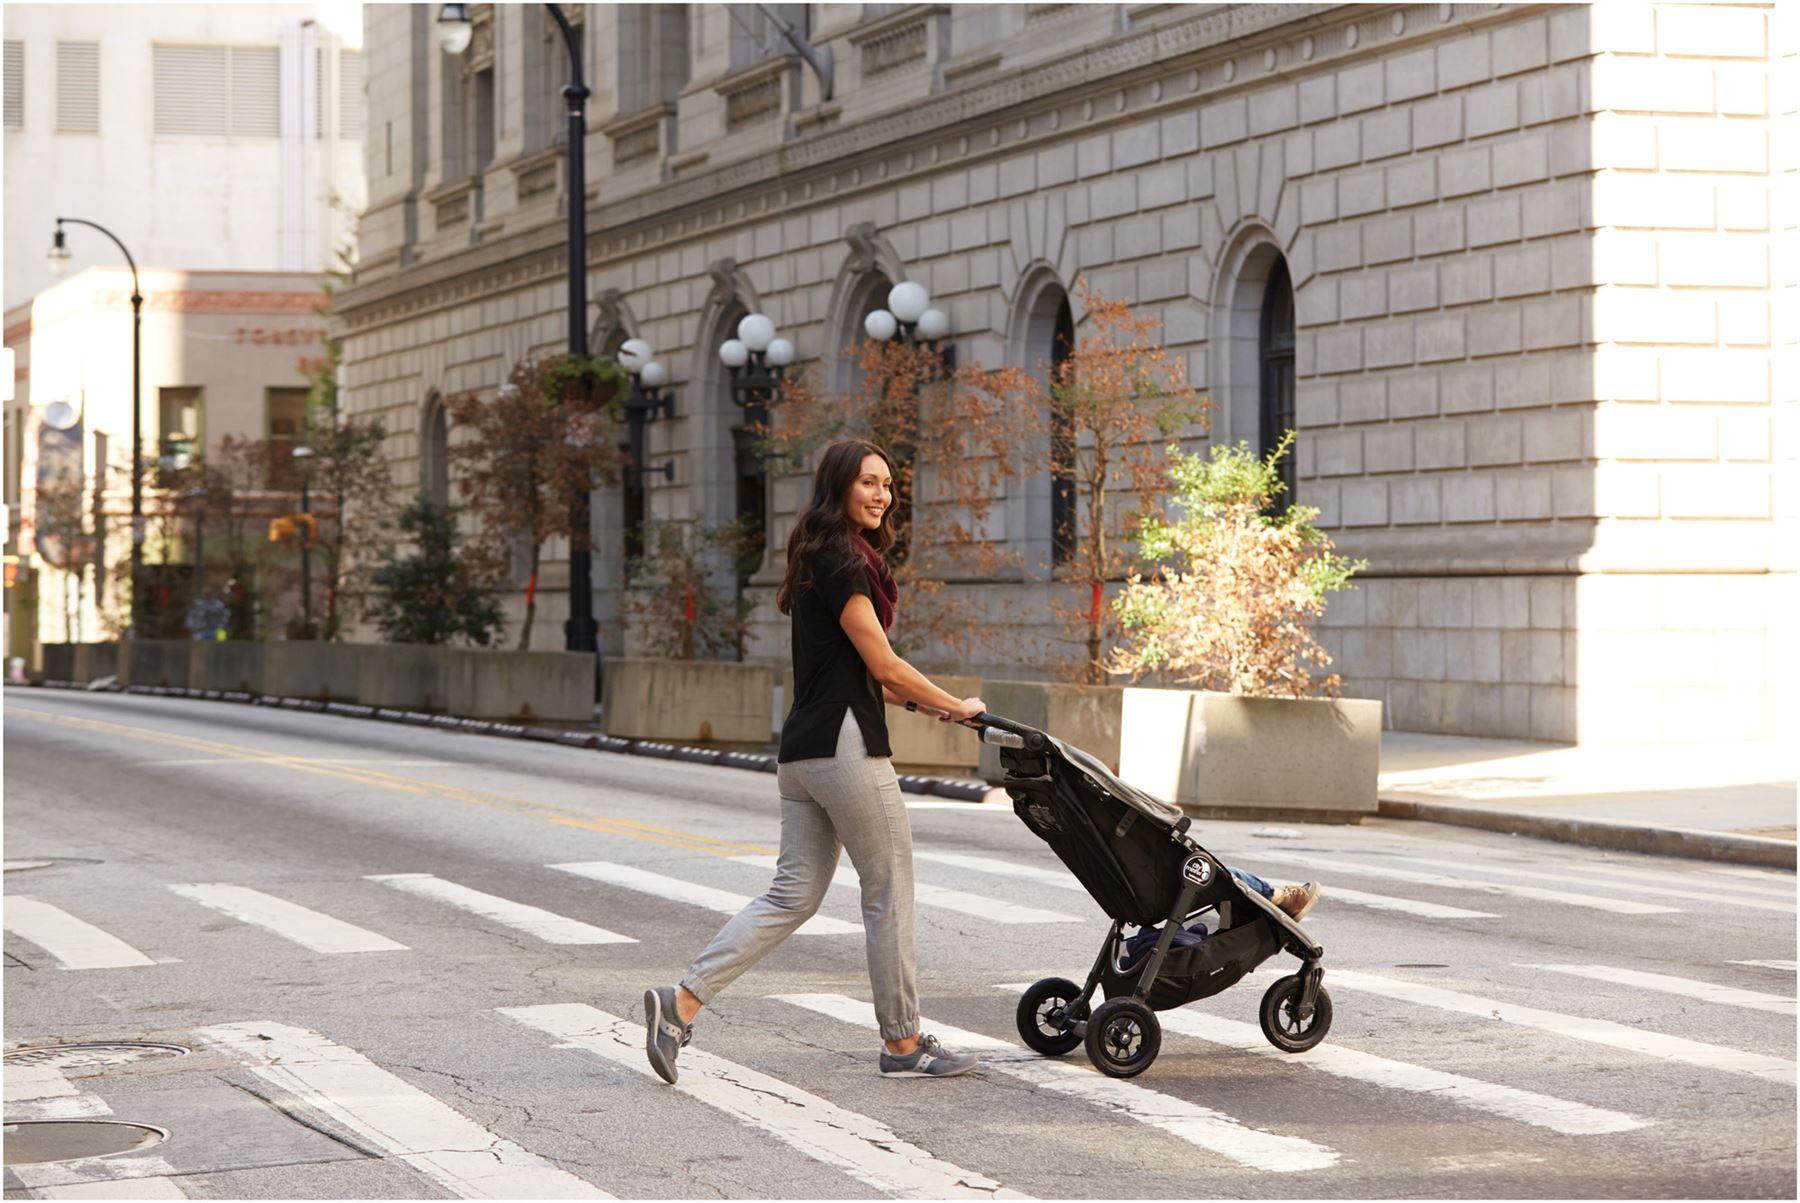 Baby Jogger CITY MINI GT SINGLE STROLLER STEEL GREY Pushchair Pram Buggy N 9